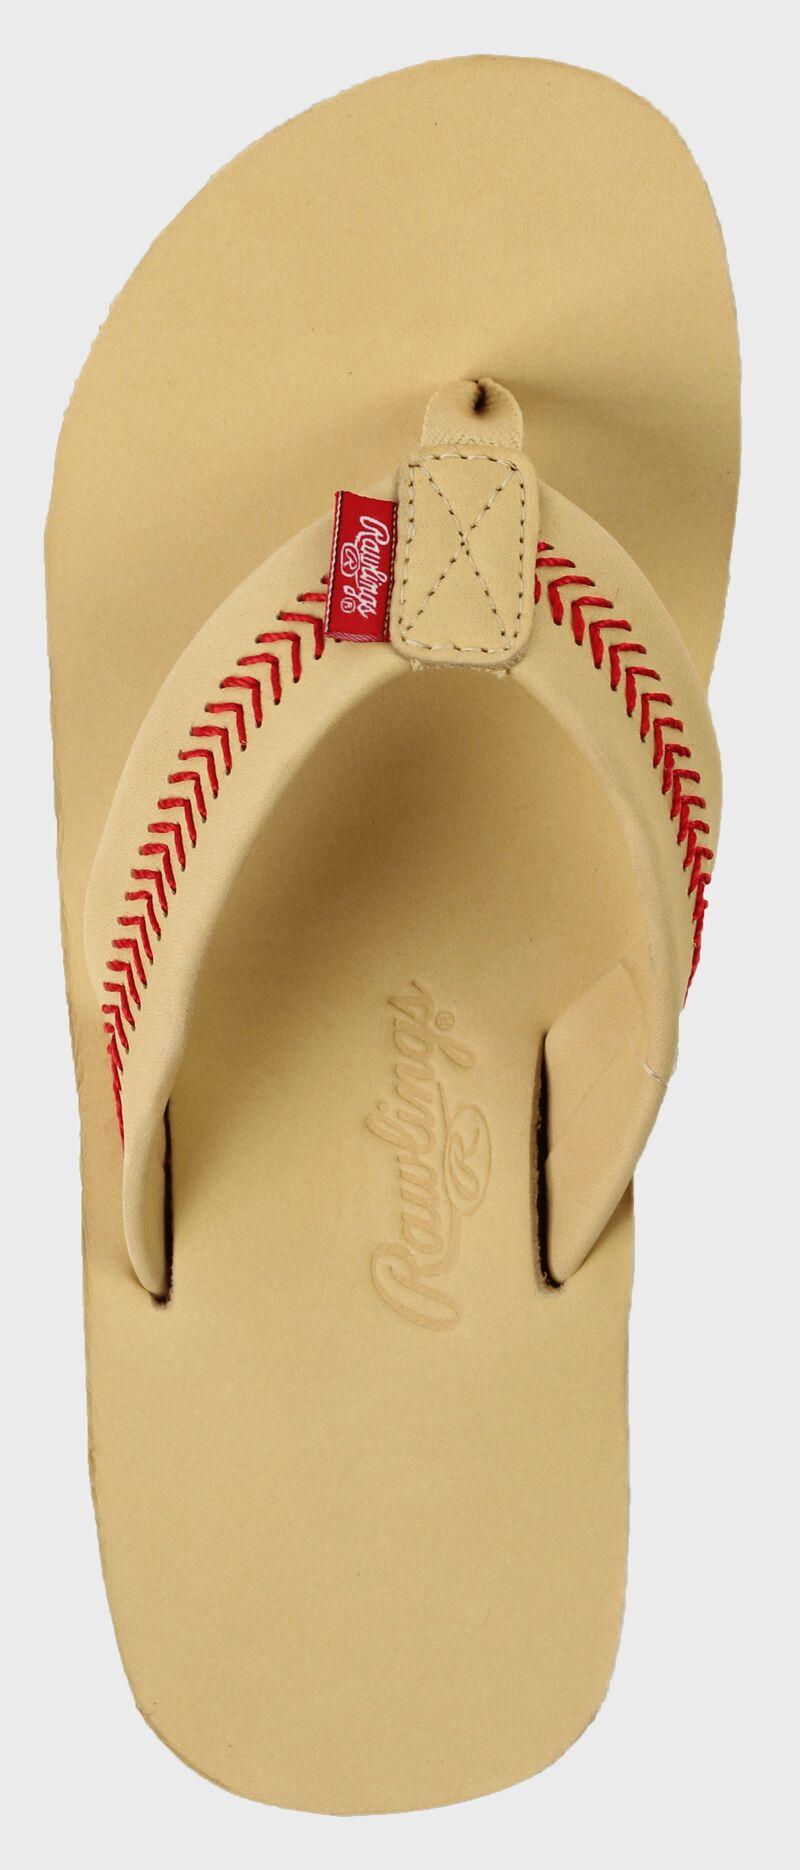 Women's Baseball Stitch Nubuck Leather Sandals